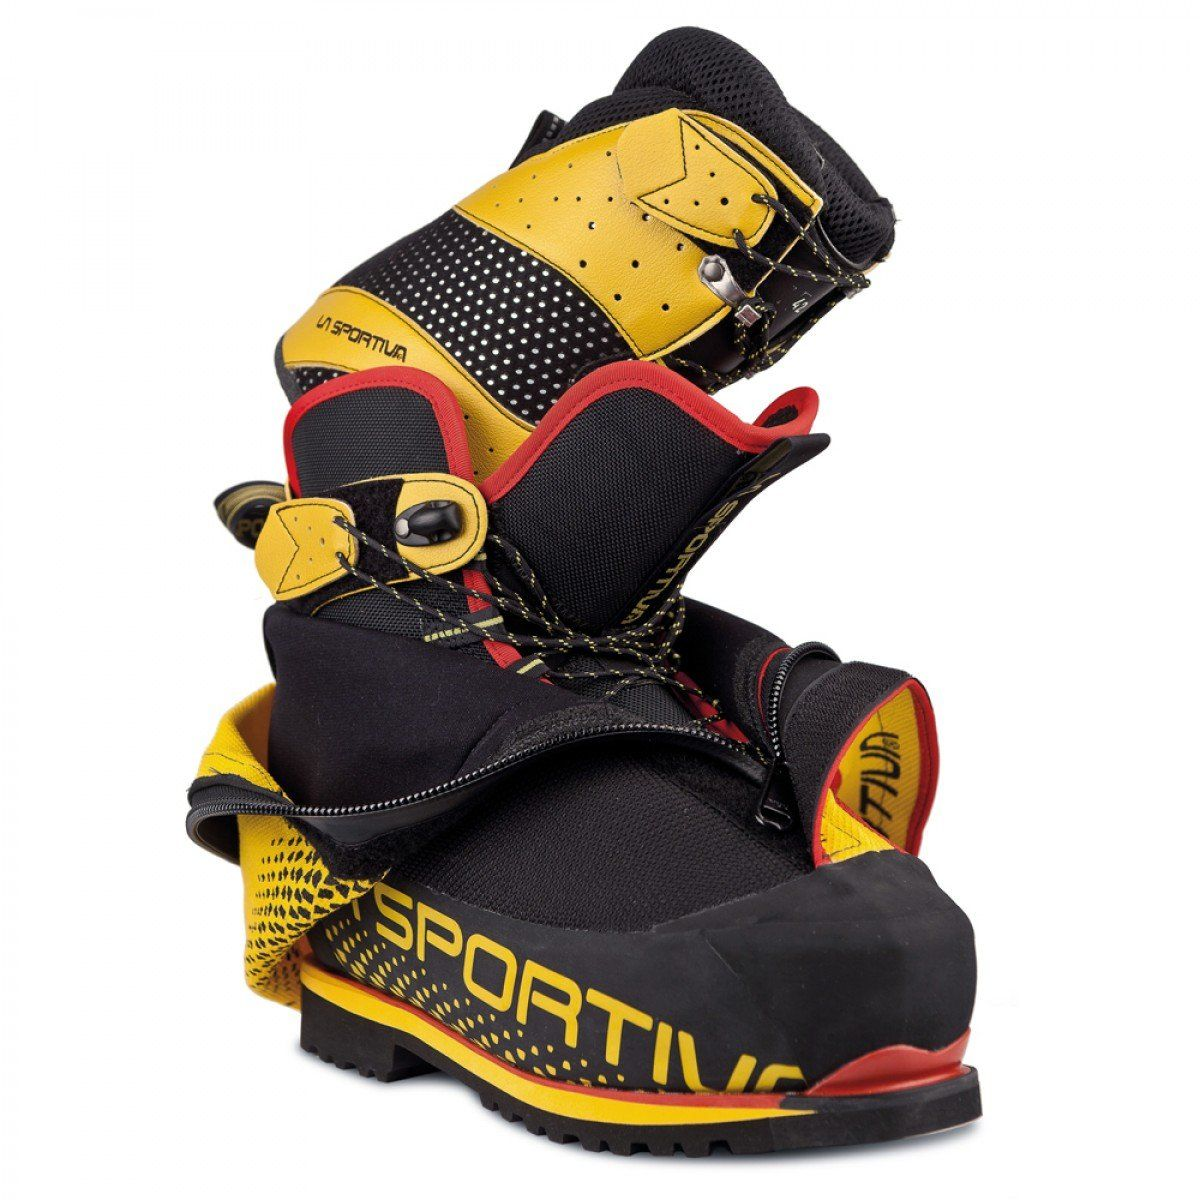 Photo of La Sportiva Olympus Mons Evo Mountaineering Boot